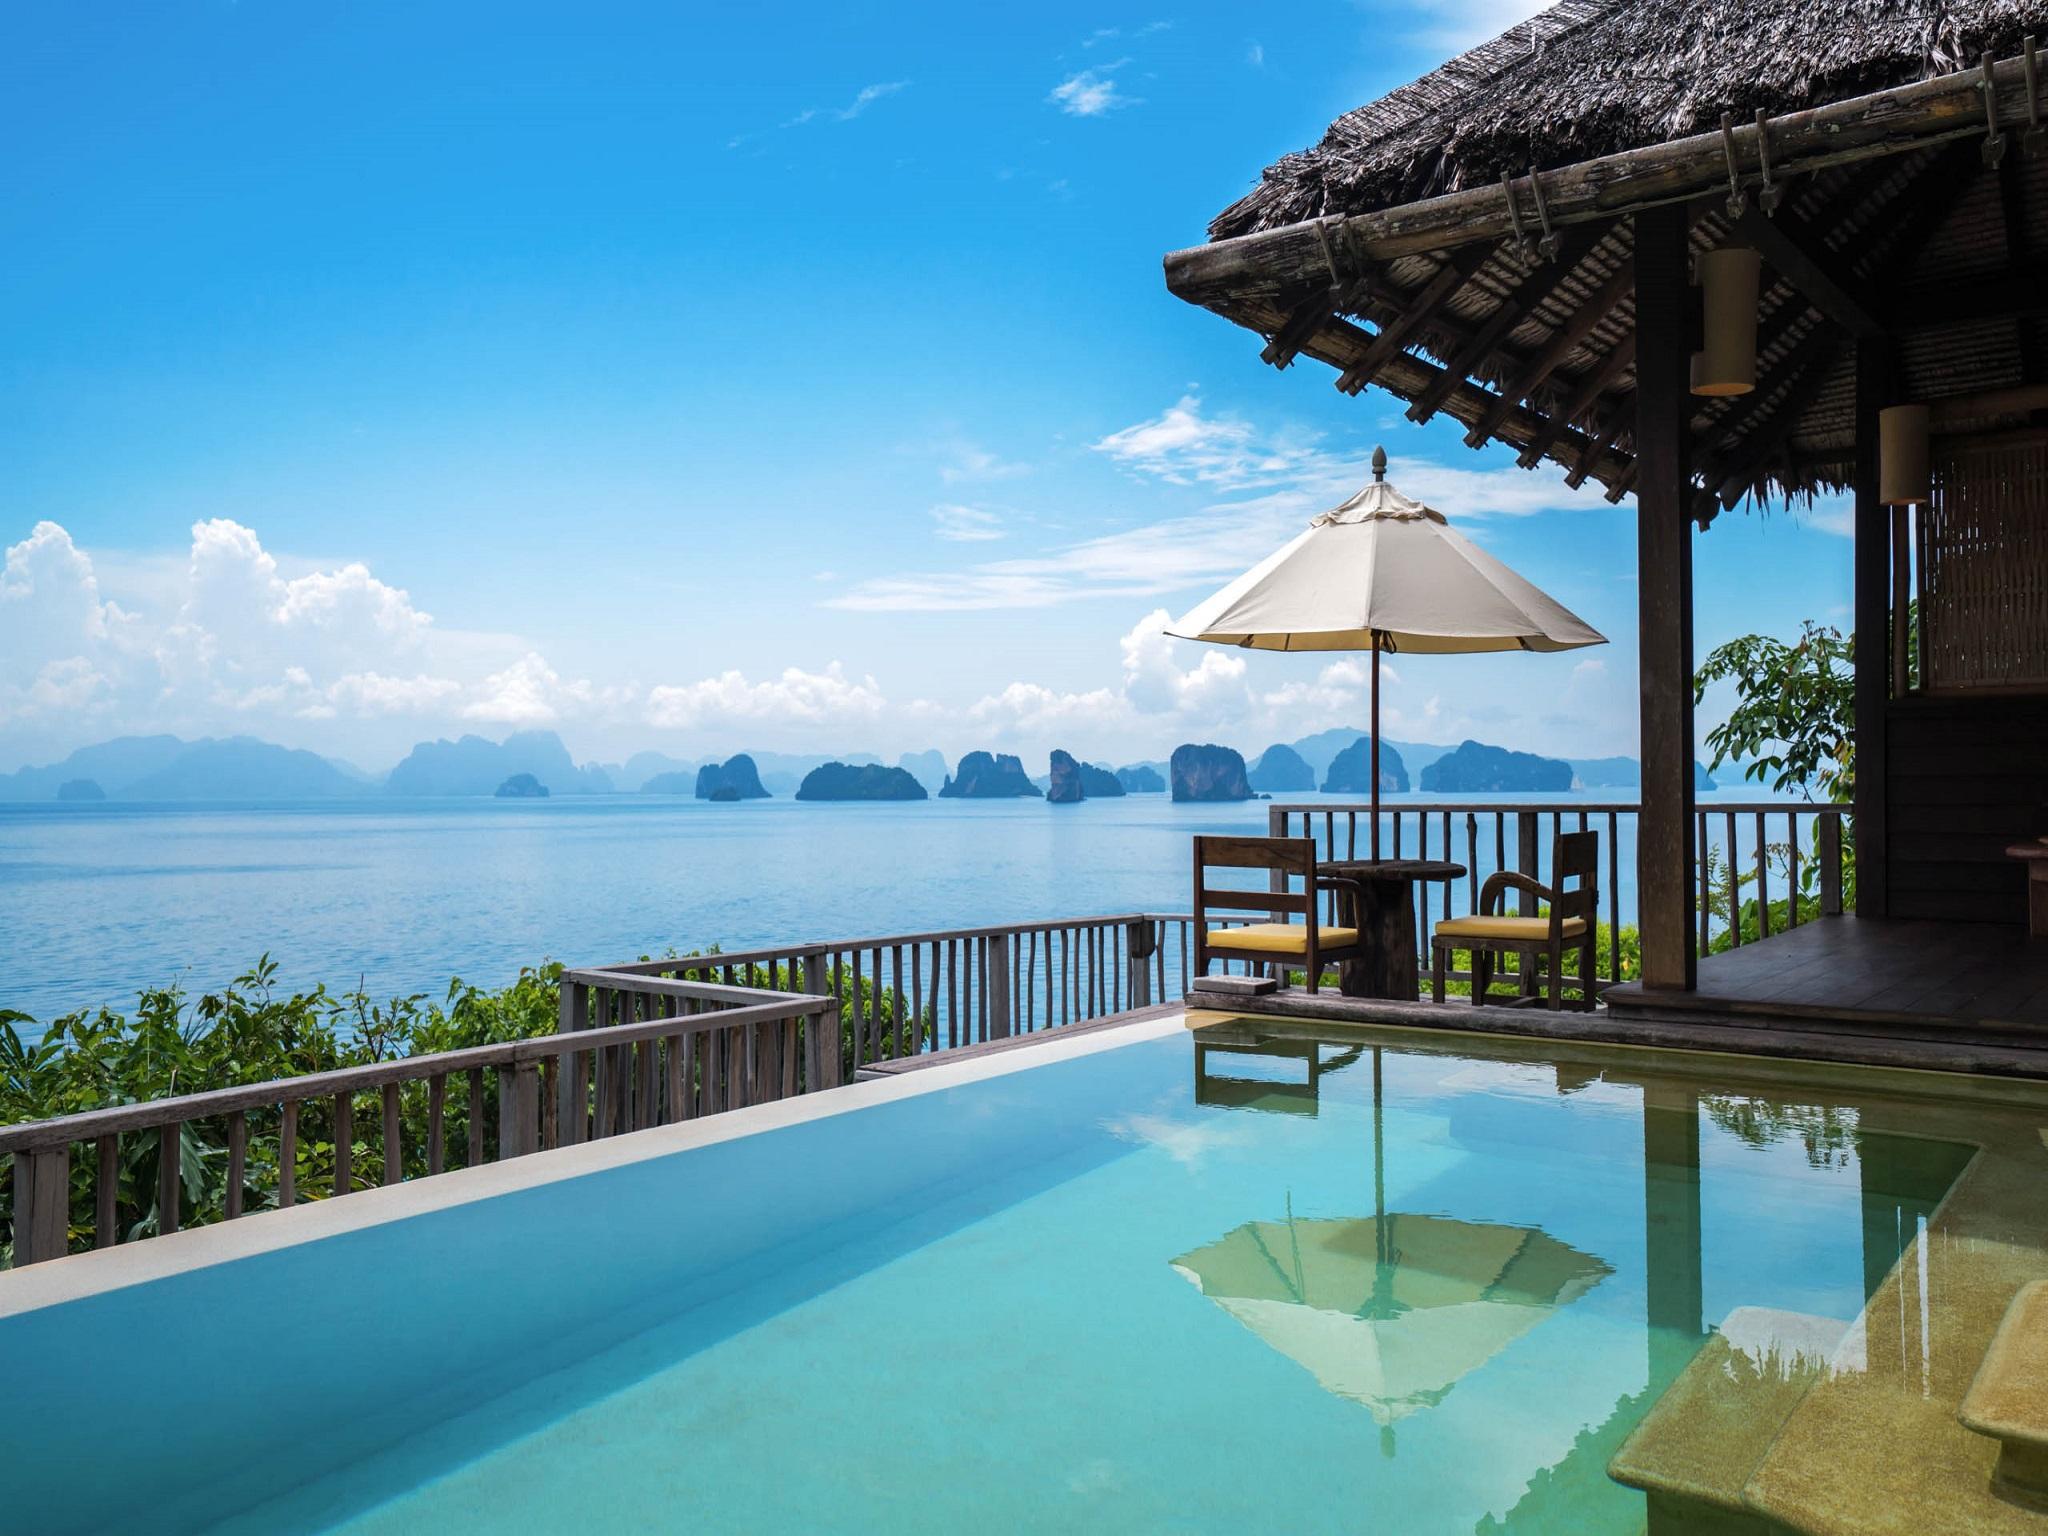 Six Senses Yao Noi - Top 10 best resorts in Thailand